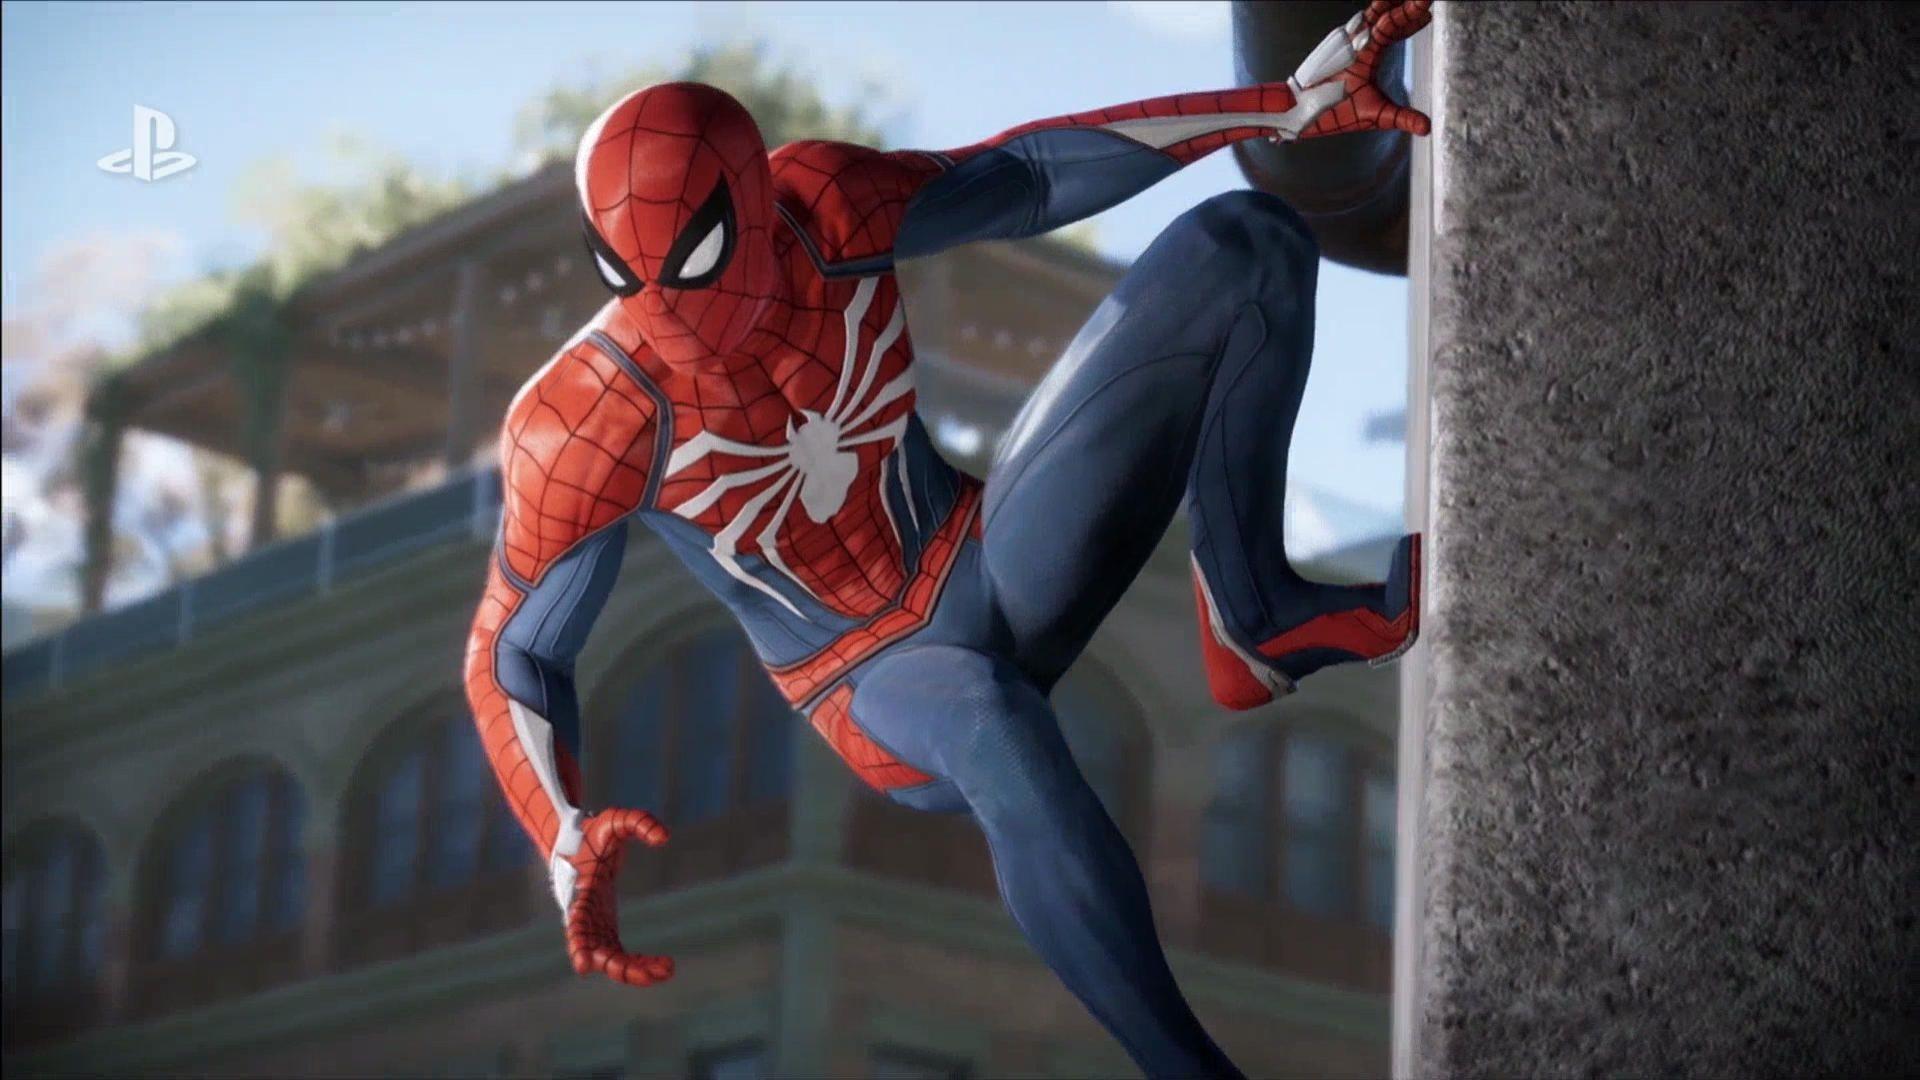 Spiderman 2018 Wallpaper Wallpapertag